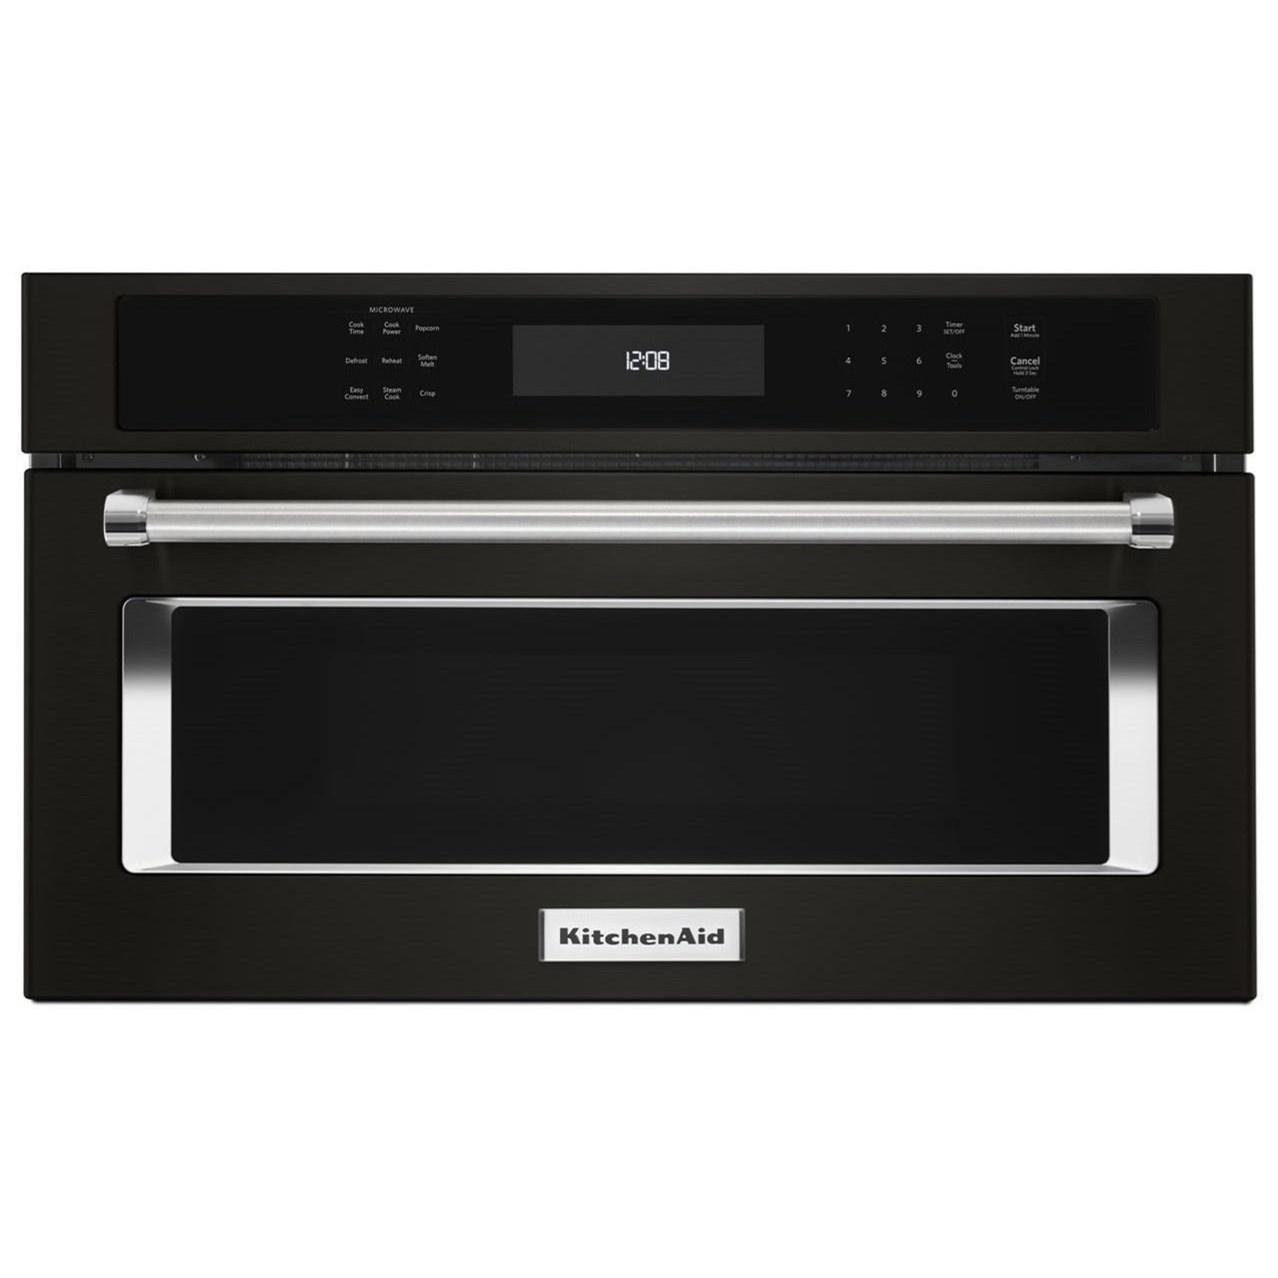 "KitchenAid Microwaves - Kitchenaid 30"" Built-In Microwave Oven - Item Number: KMBP100EBS"